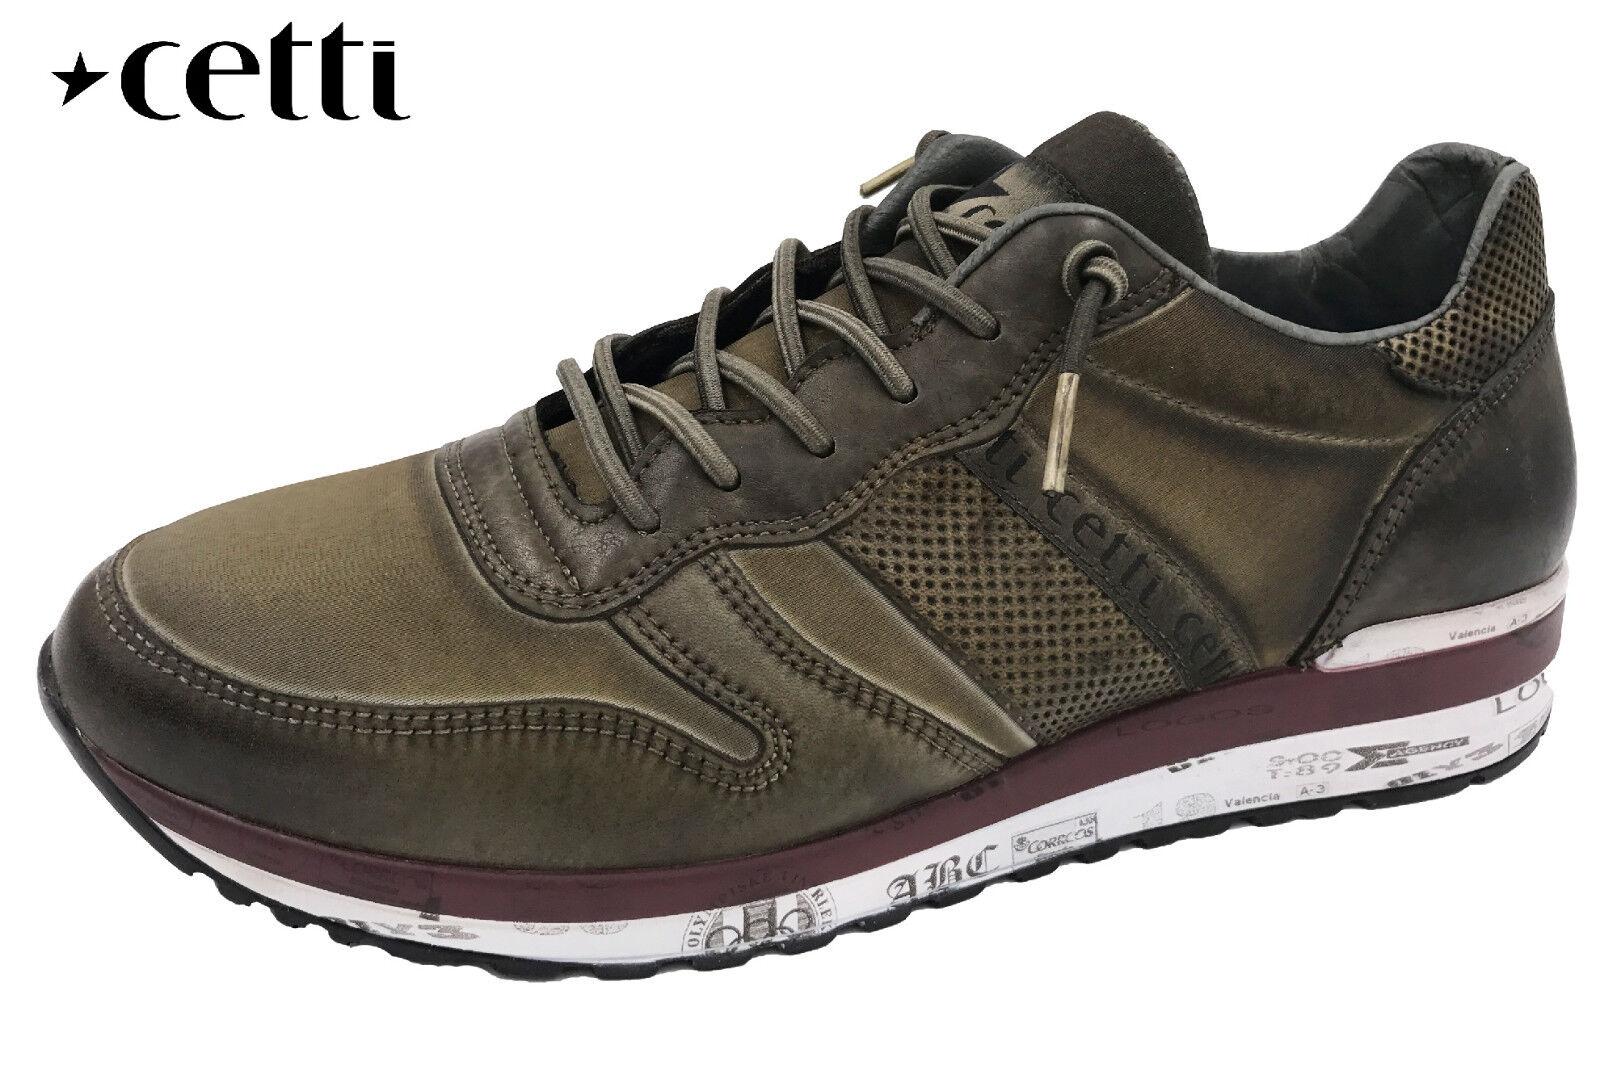 CETTI Herren Turnschuhe Oliv Grün Khaki Leder Schuhe Used-Look NEU C847